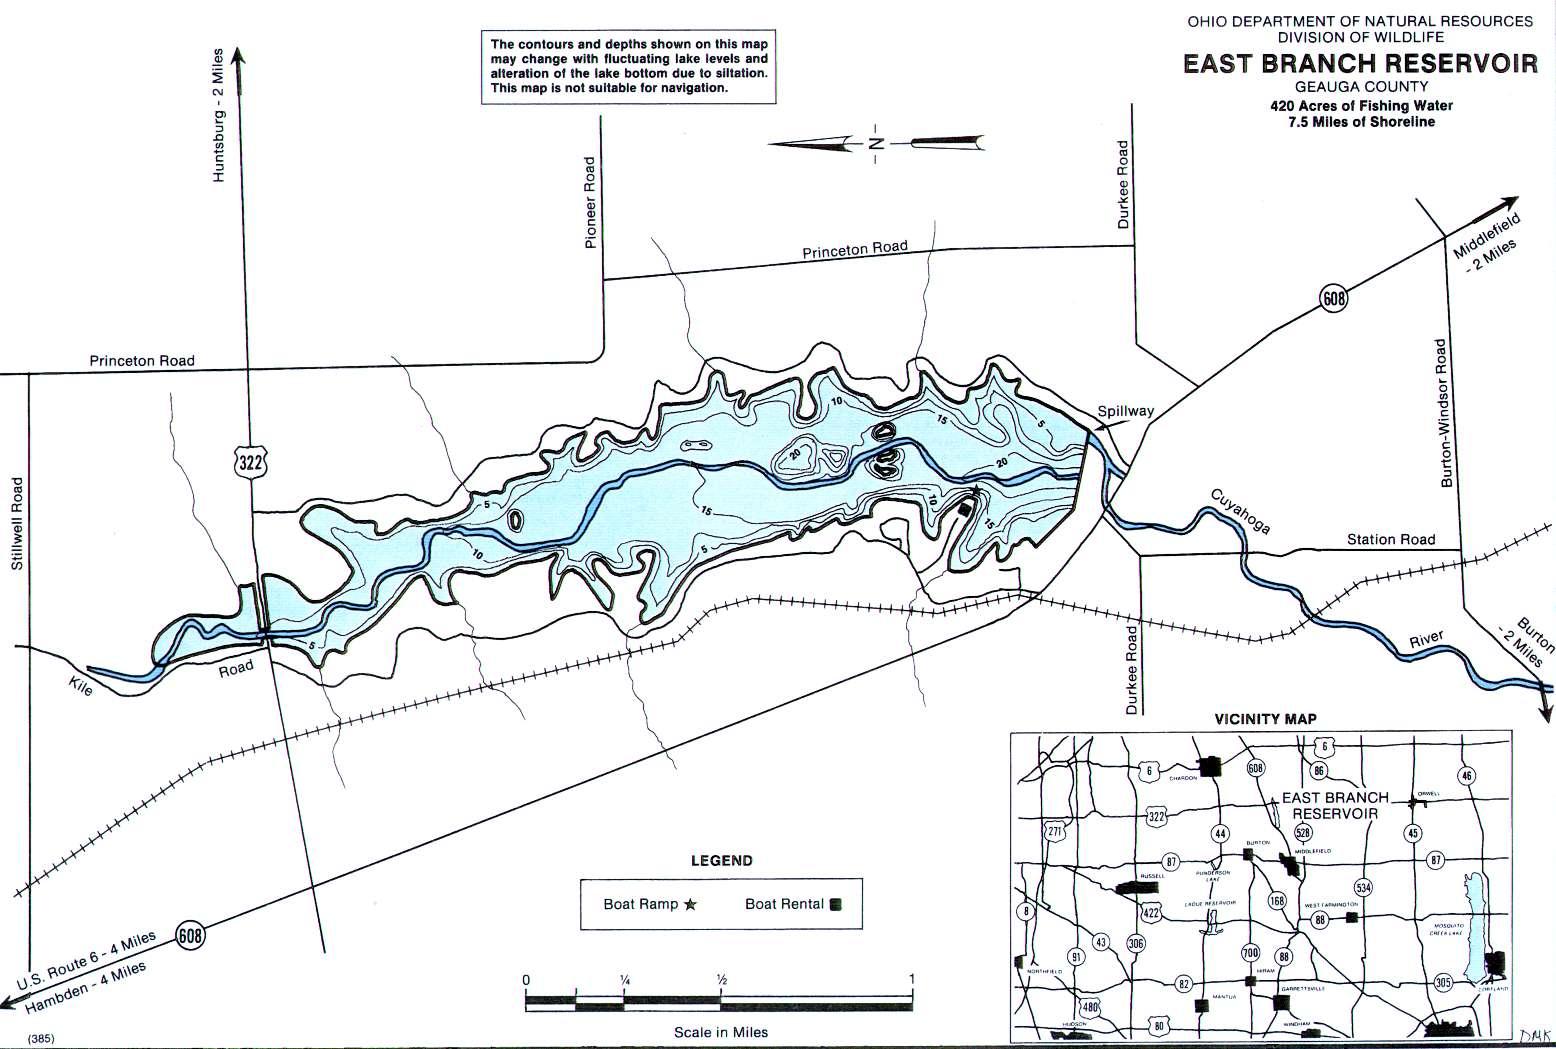 East Branch Reservoir Fishing Map - GoFishOhio